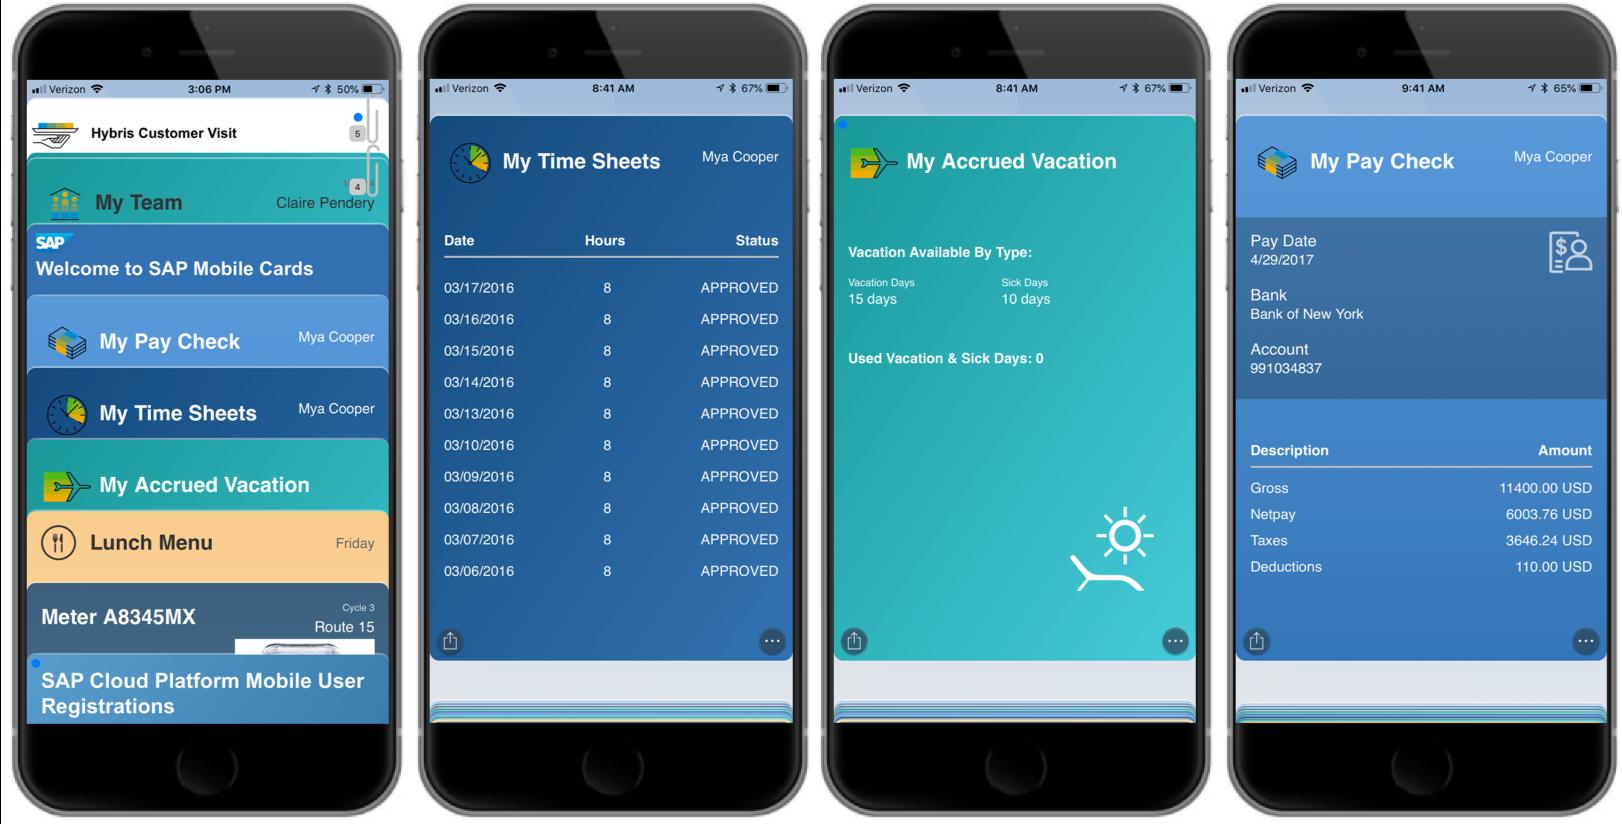 Fiori Apps mobil nutzen